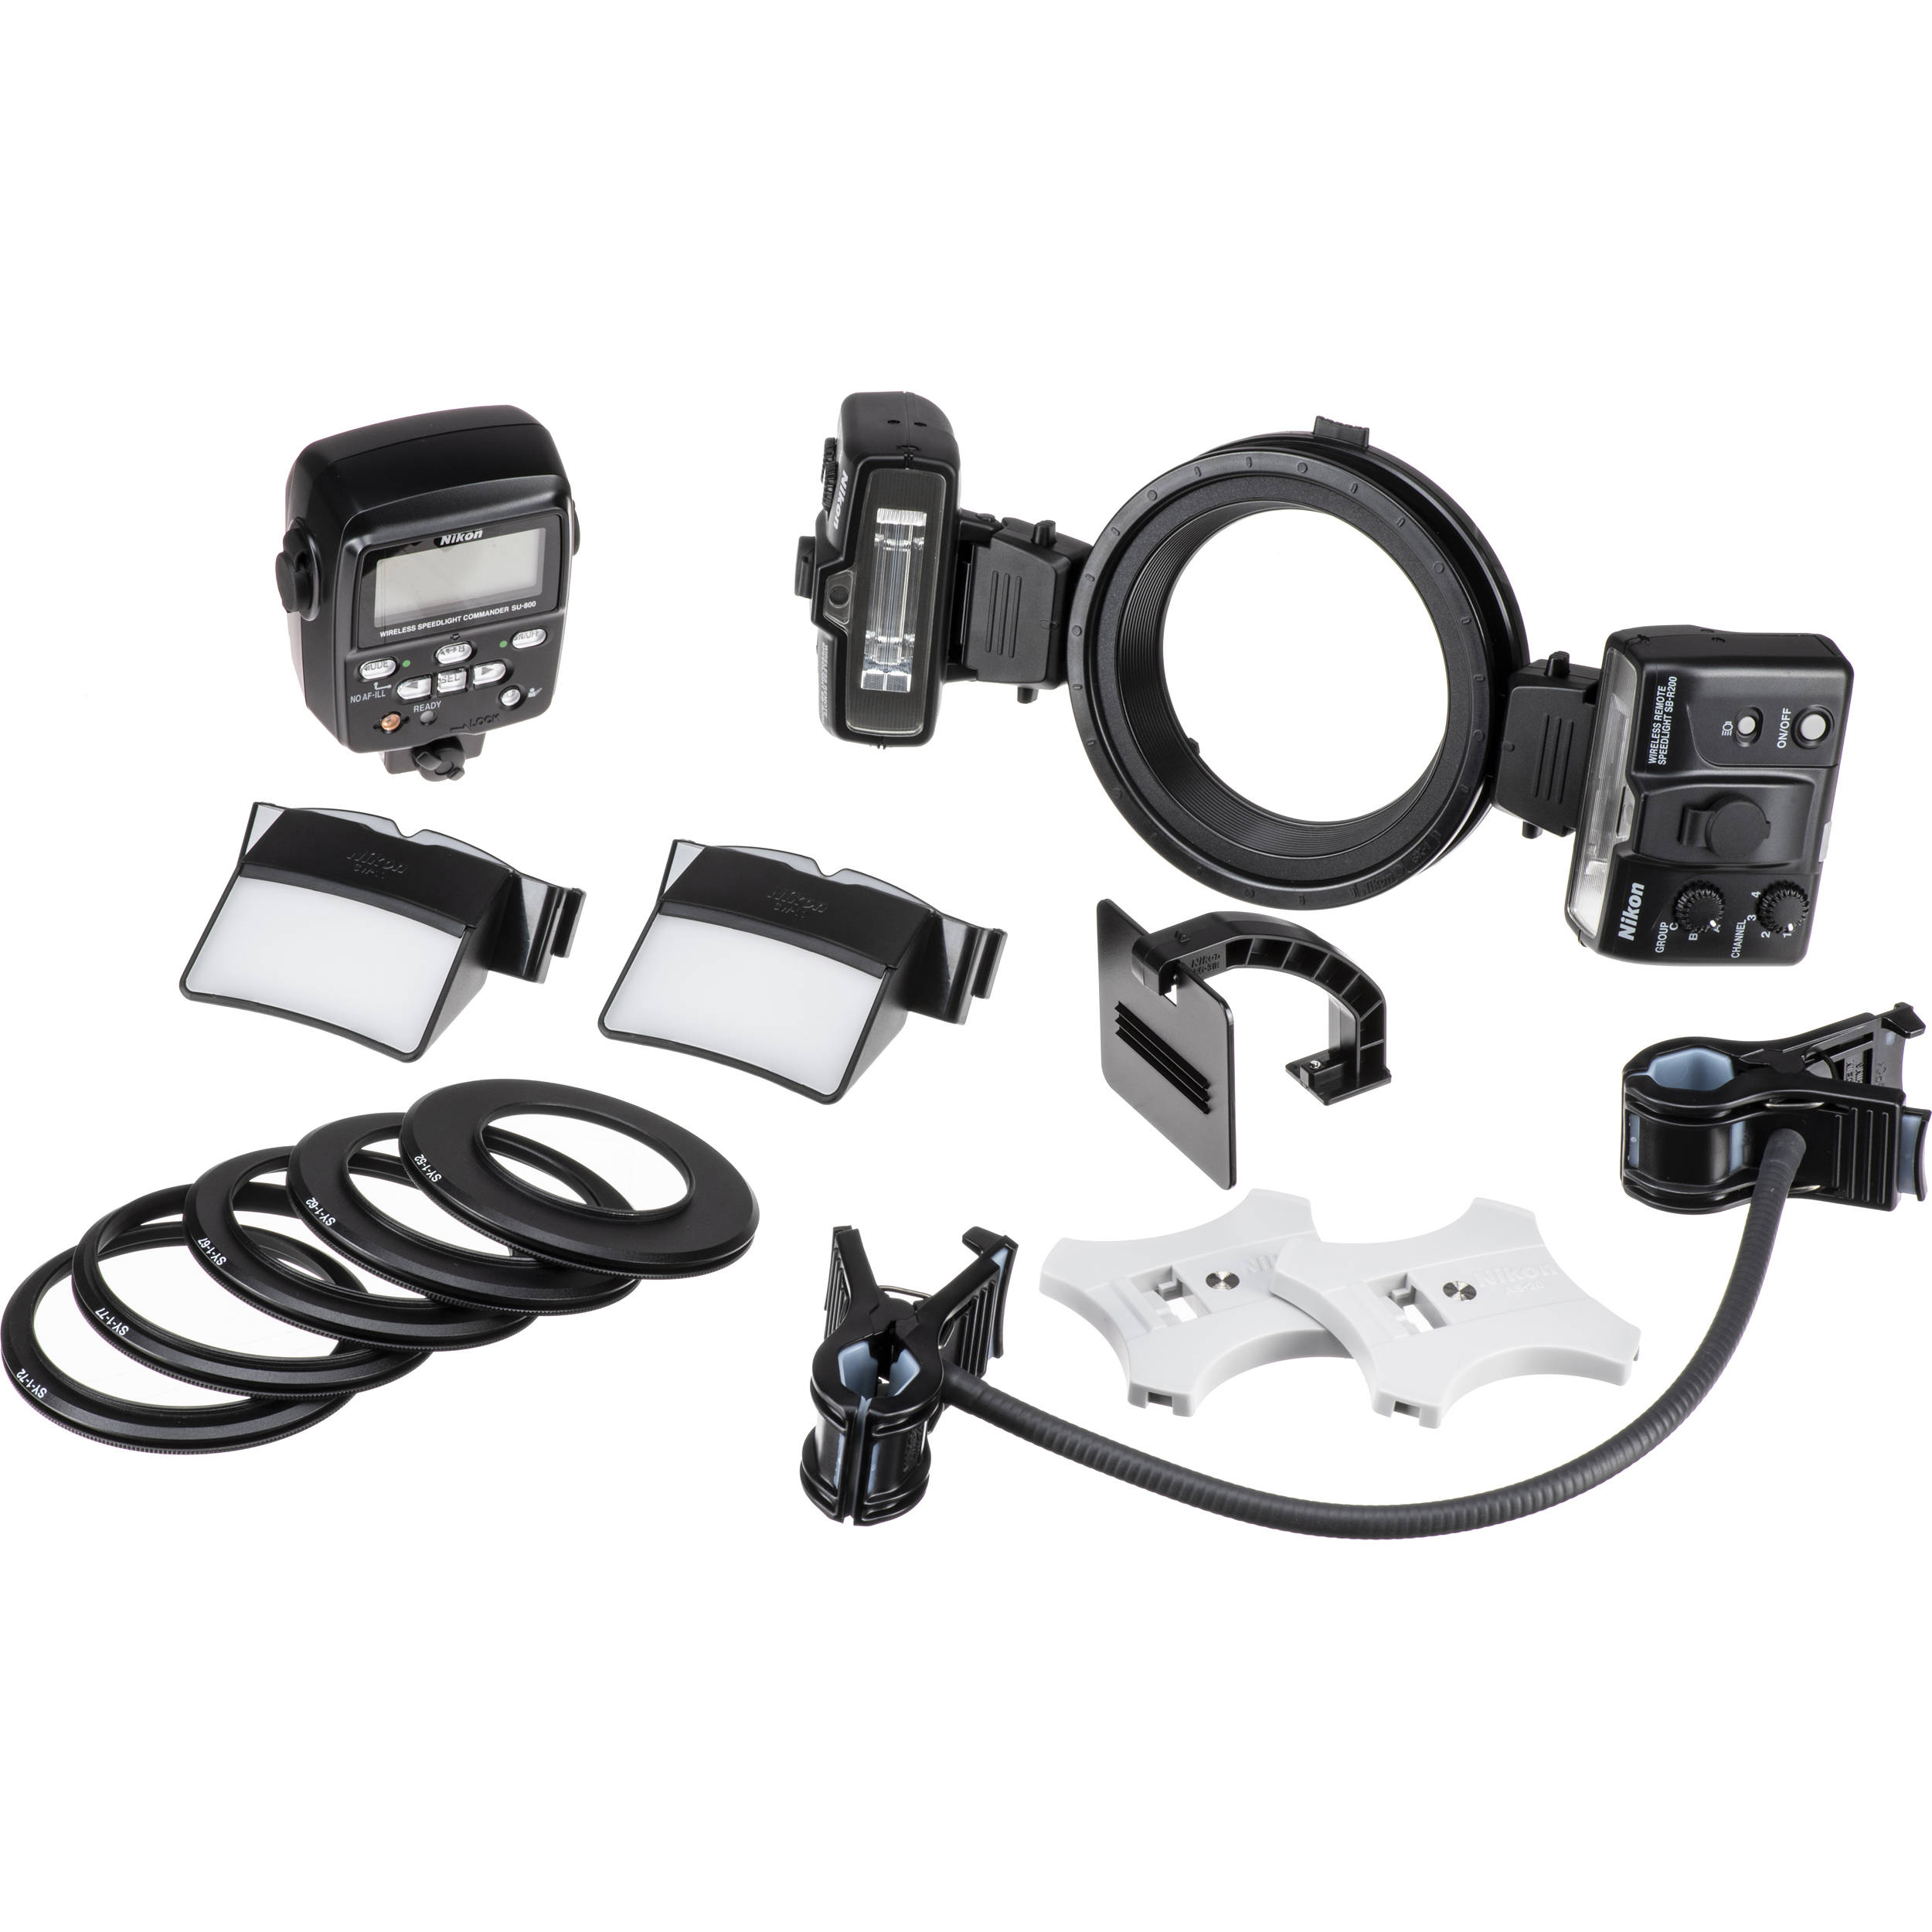 Nikon 4803 R1C1 Wireless Close Up mander